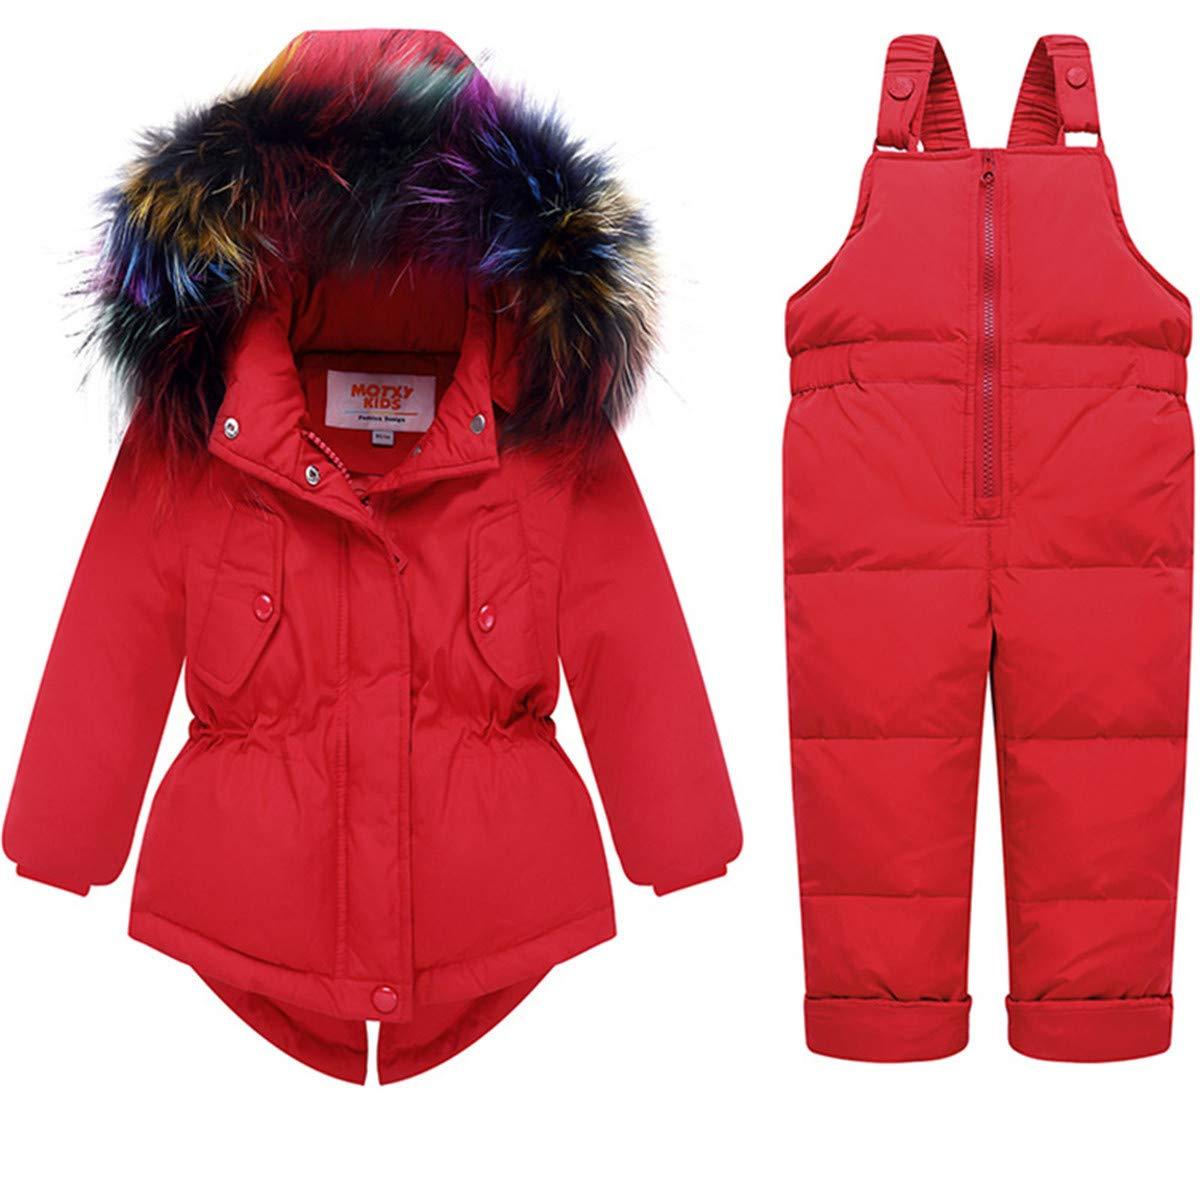 FAIRYRAIN Little Kids Baby Girls Two Piece Winter Warm Colorful Fur Trim Hooded Snowsuit Puffer Down Jacket Snow Ski Bib Pants Outfits Outwear pdfwj-t42